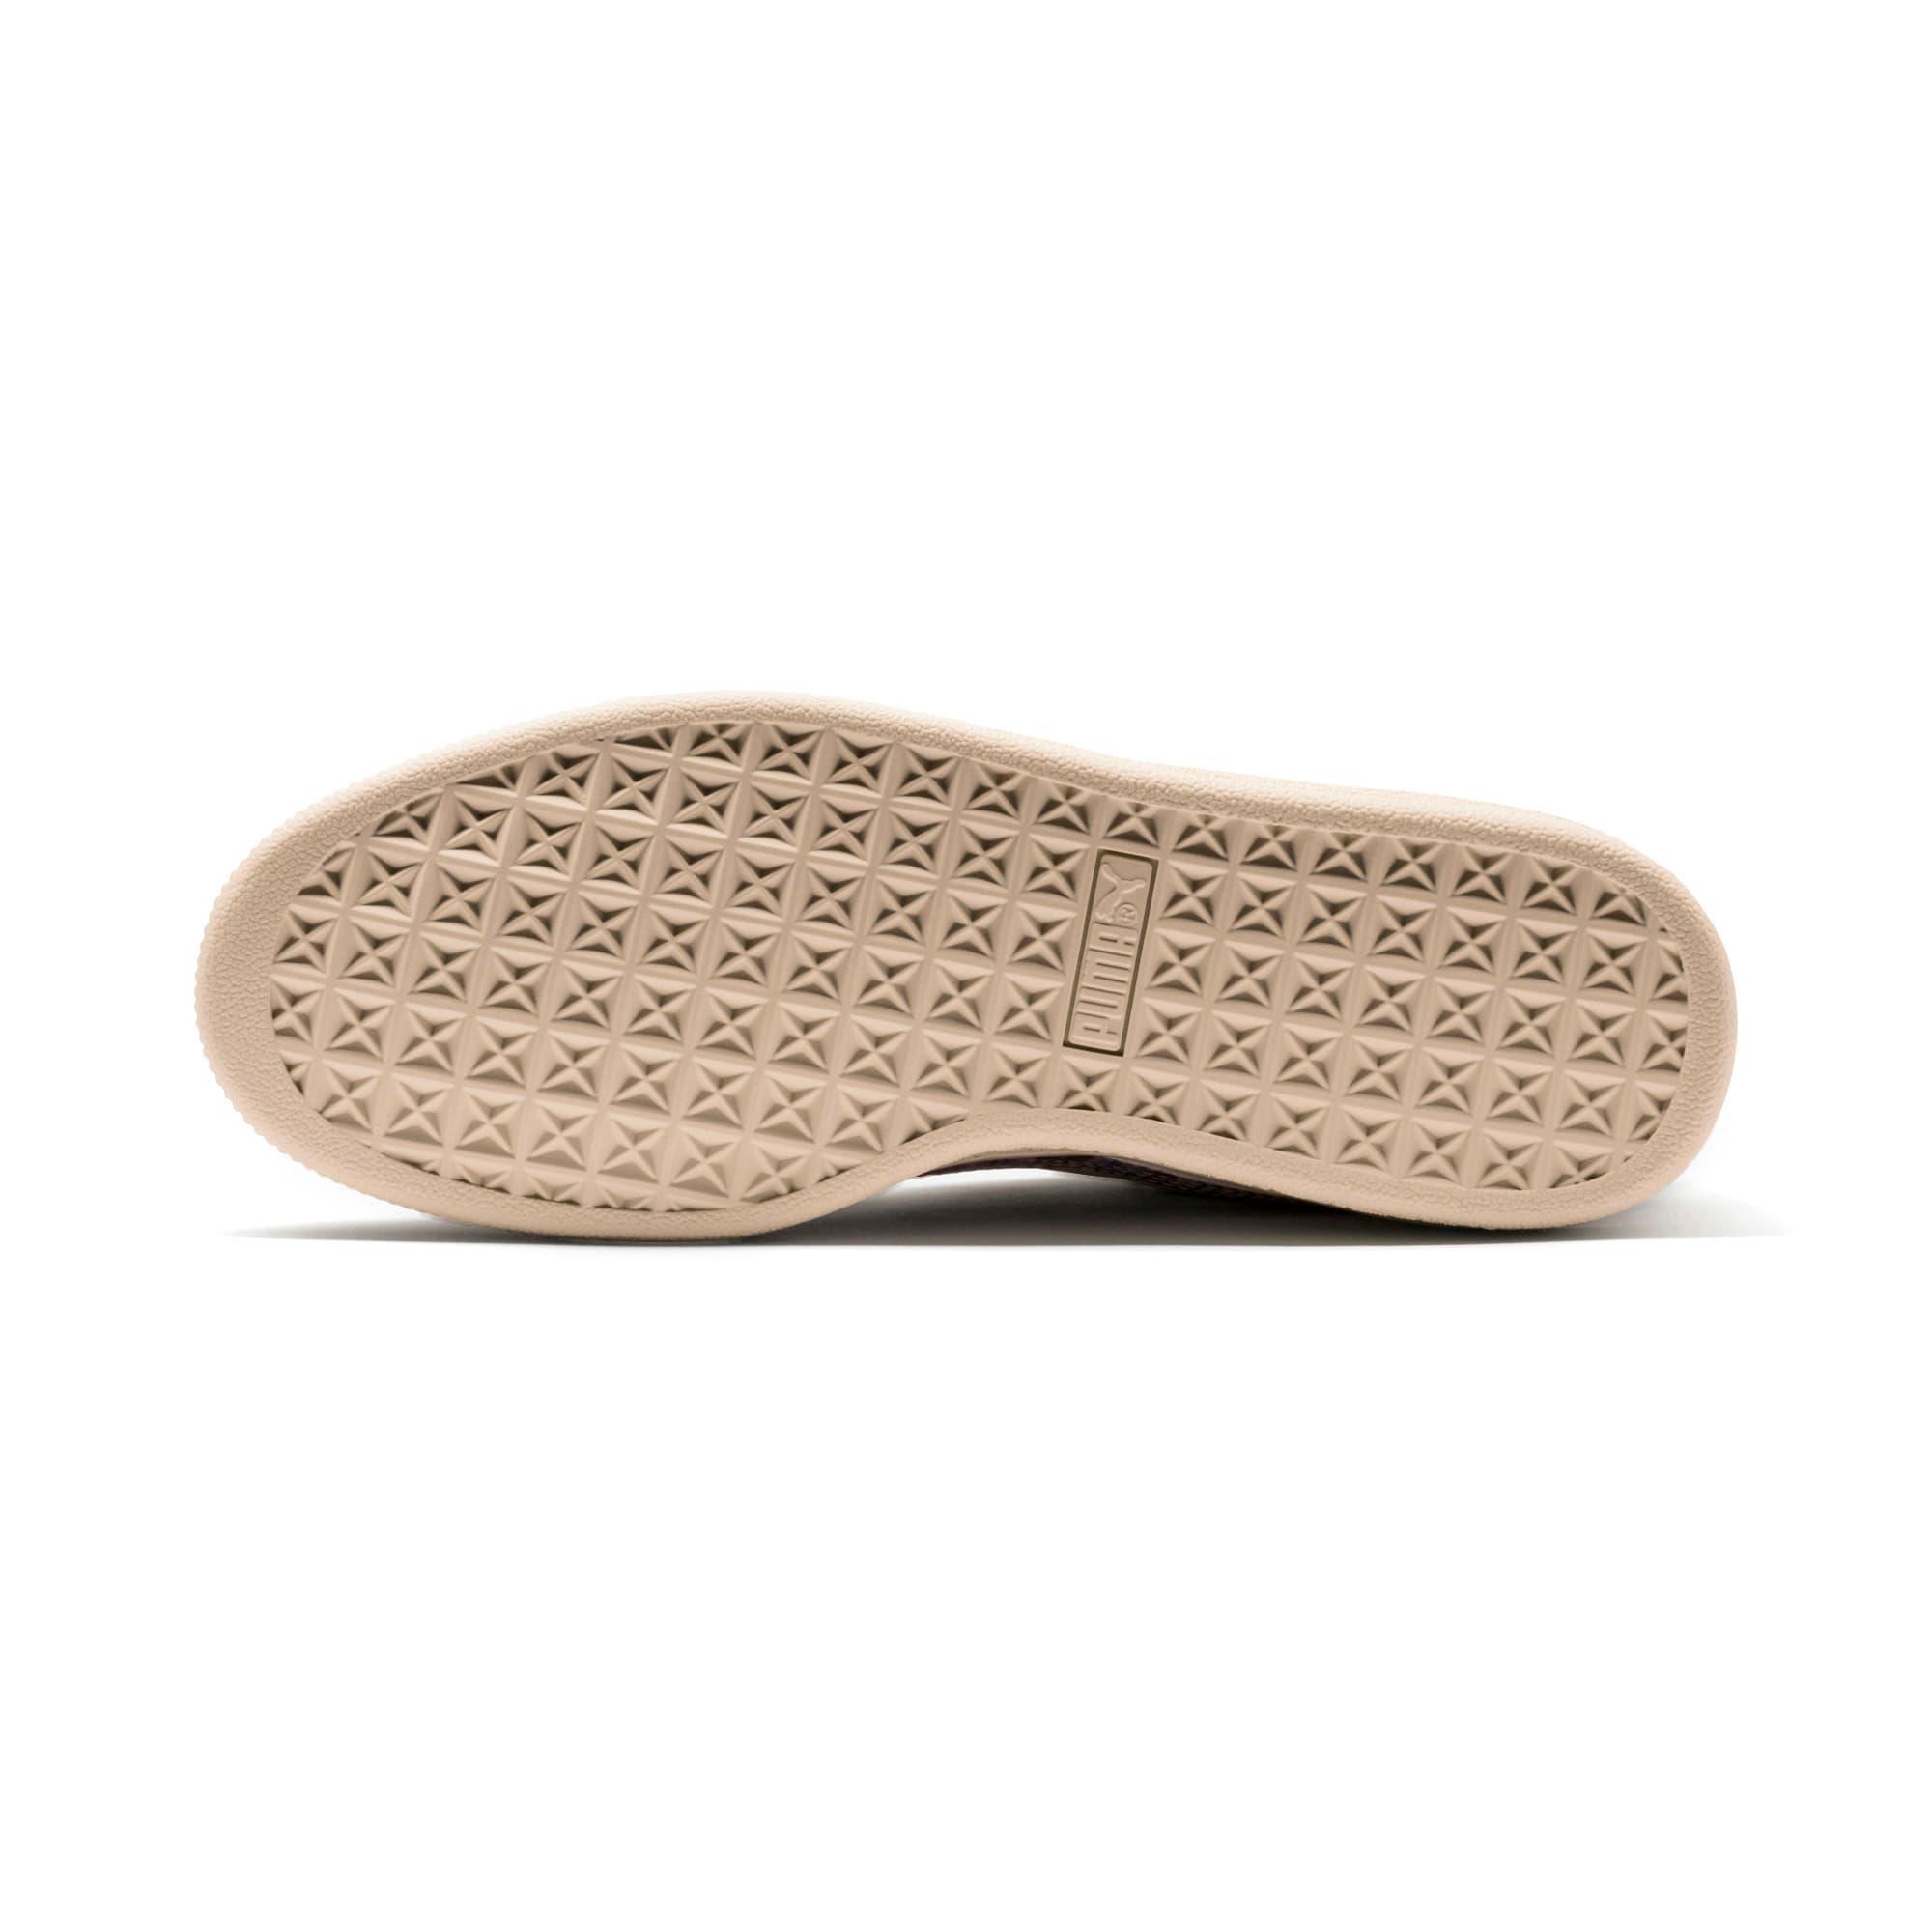 Thumbnail 3 of Basket Classic Mimicry Women's Sneakers, Vanilla Cream-Vanilla Cream, medium